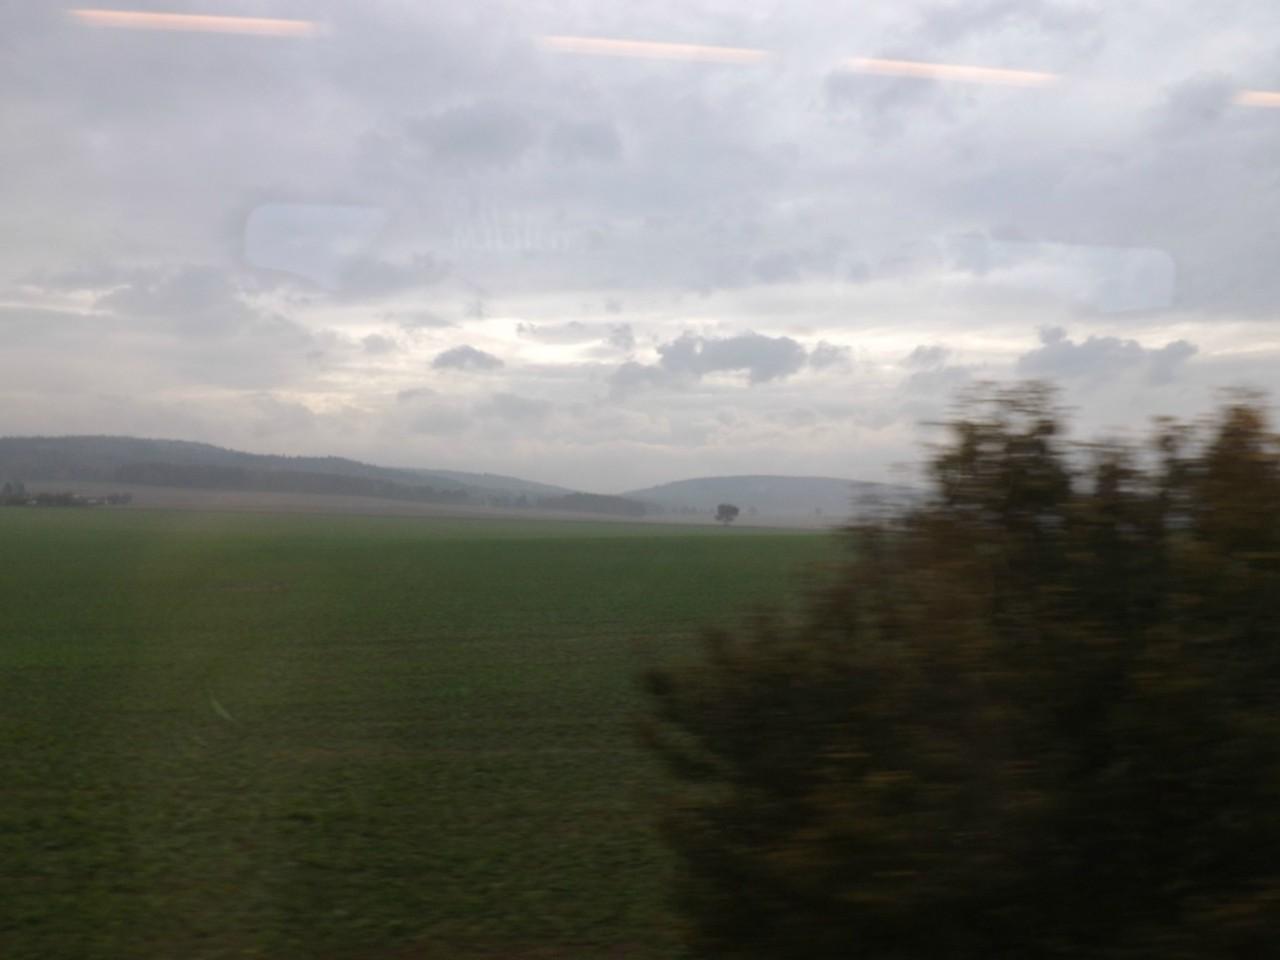 fast daheim - Oberlausitzer Landschaft